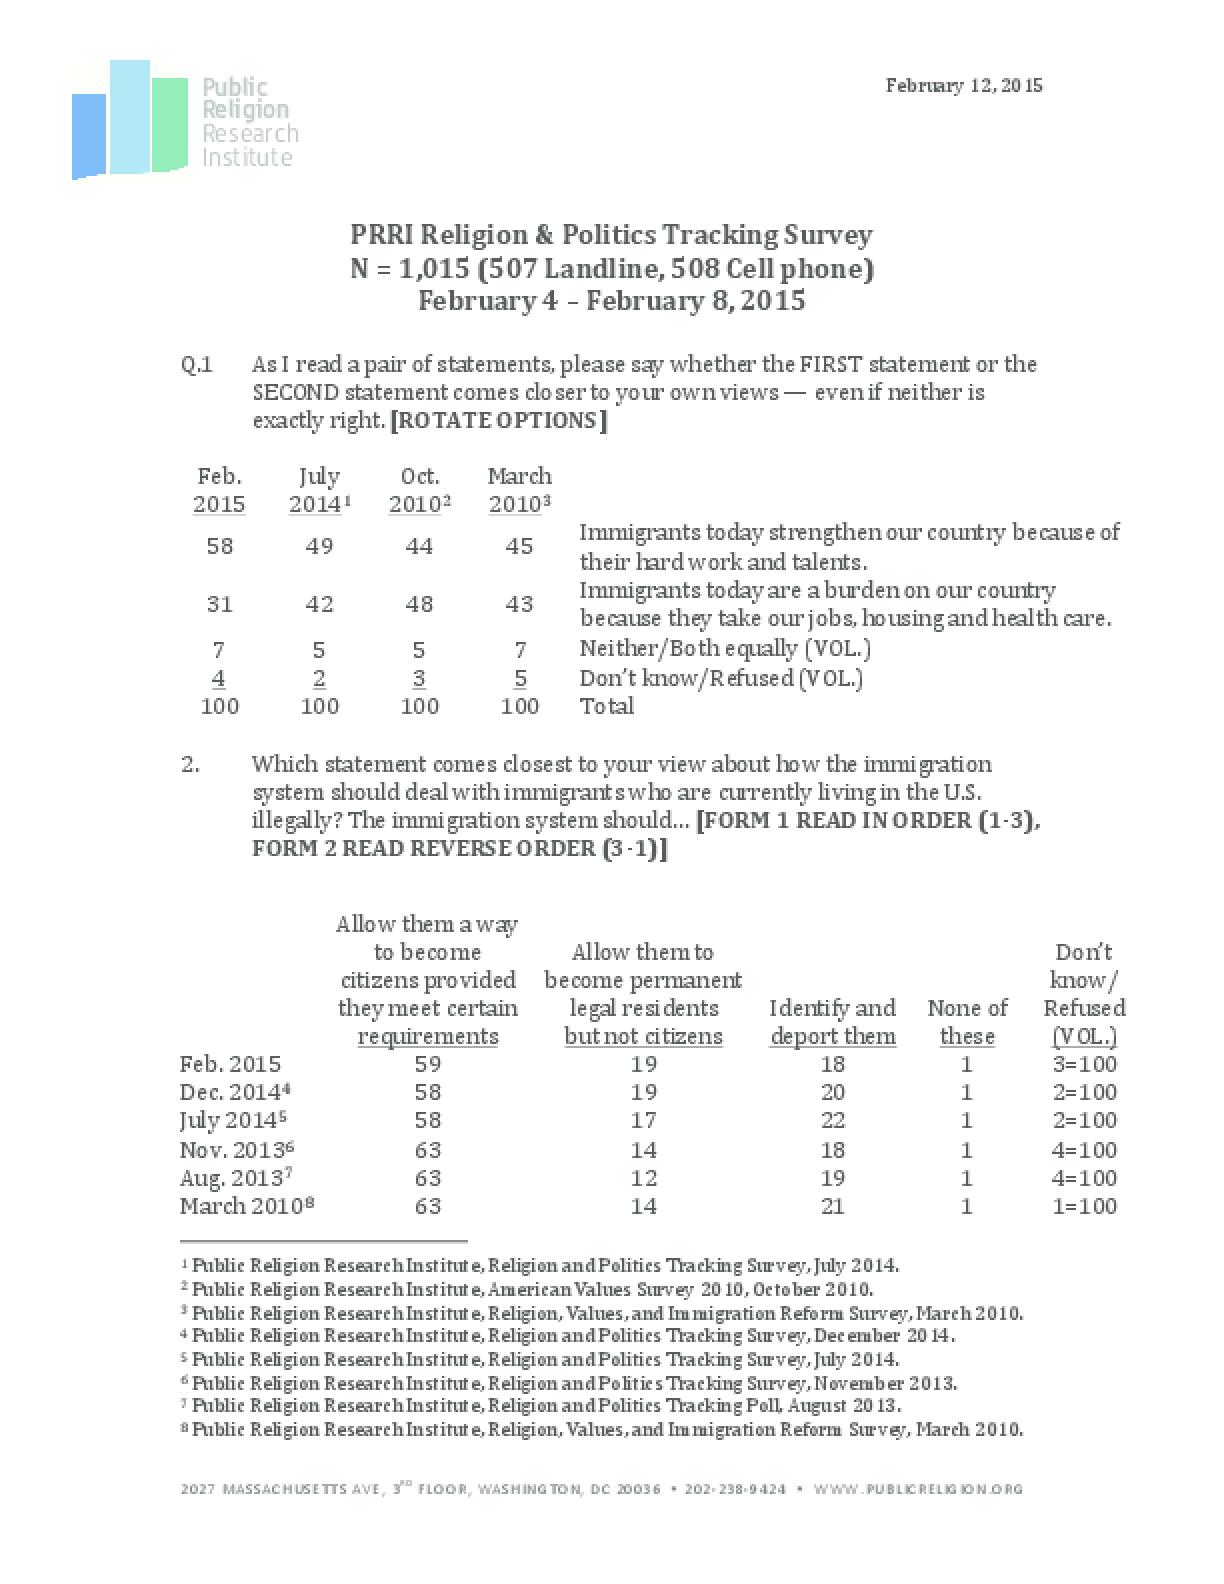 PRRI Religion and Politics Tracking Survey